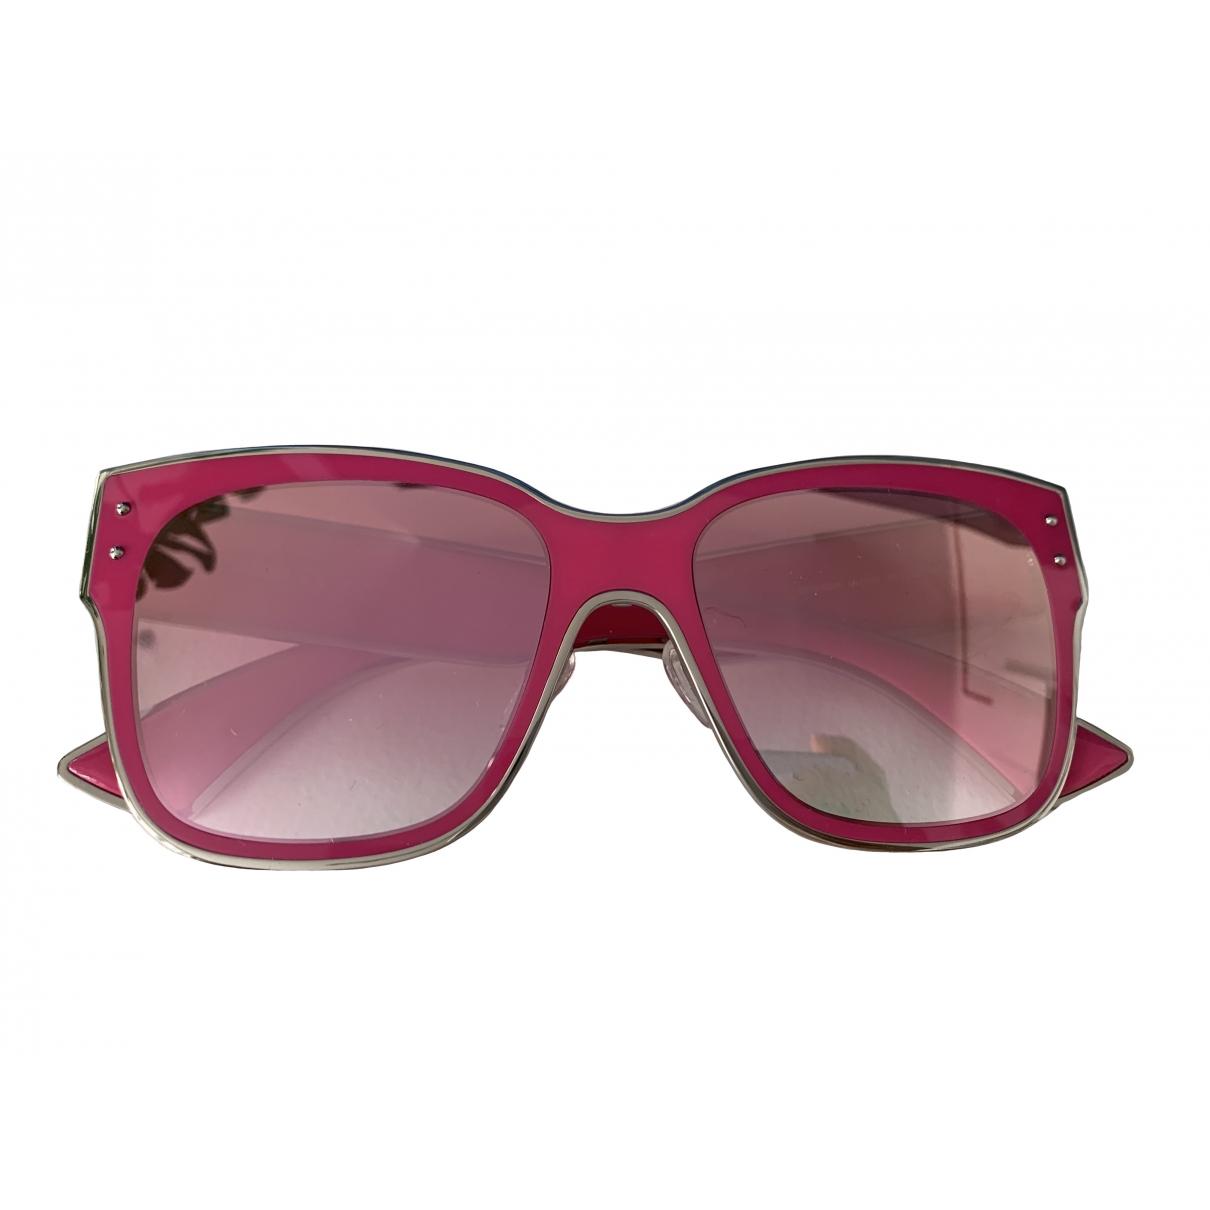 Moschino - Lunettes   pour femme en metal - rose